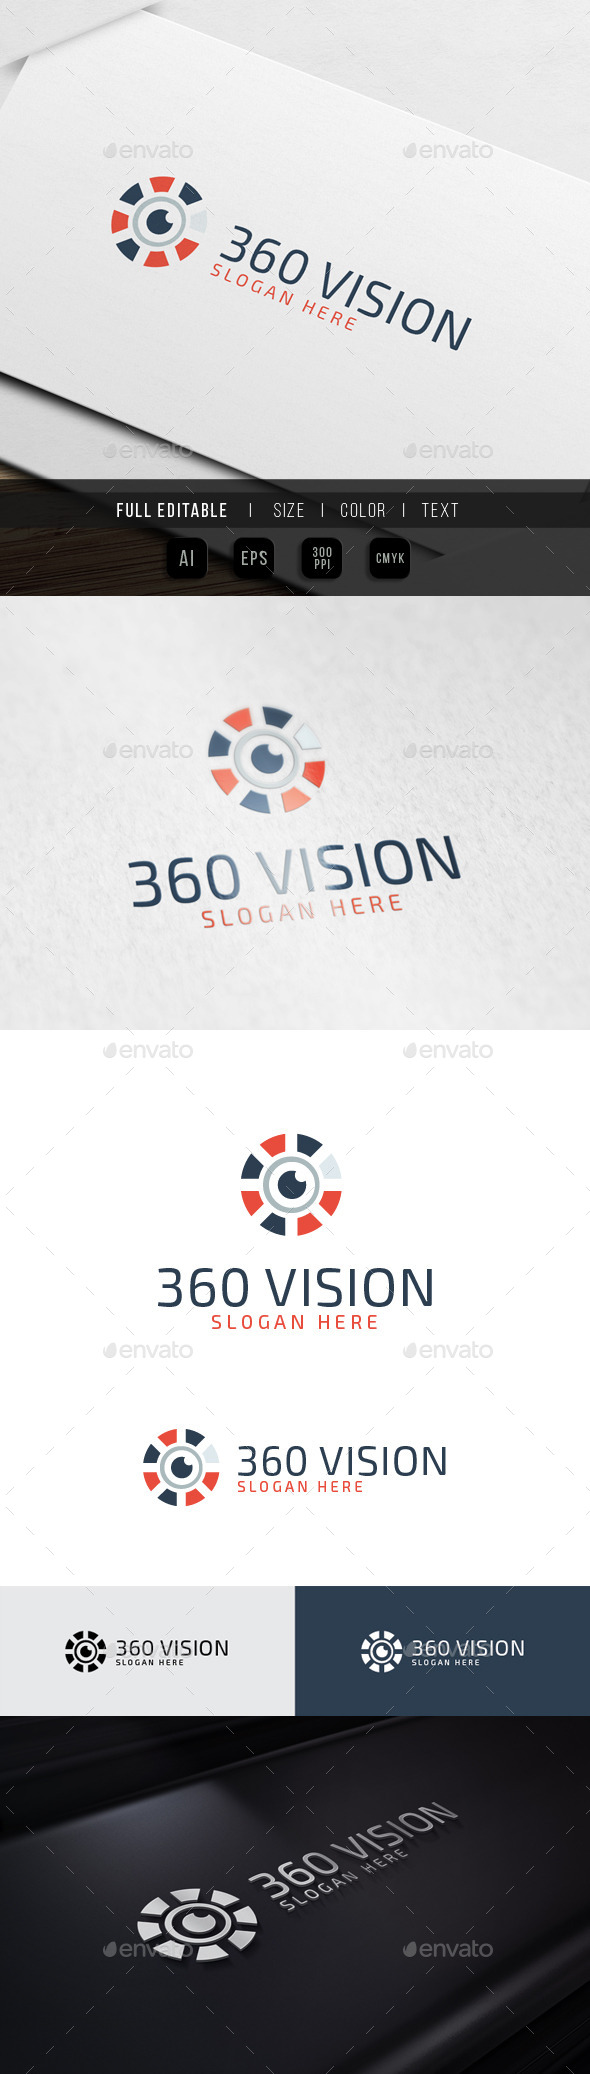 GraphicRiver 360 Vision View Media 10434893